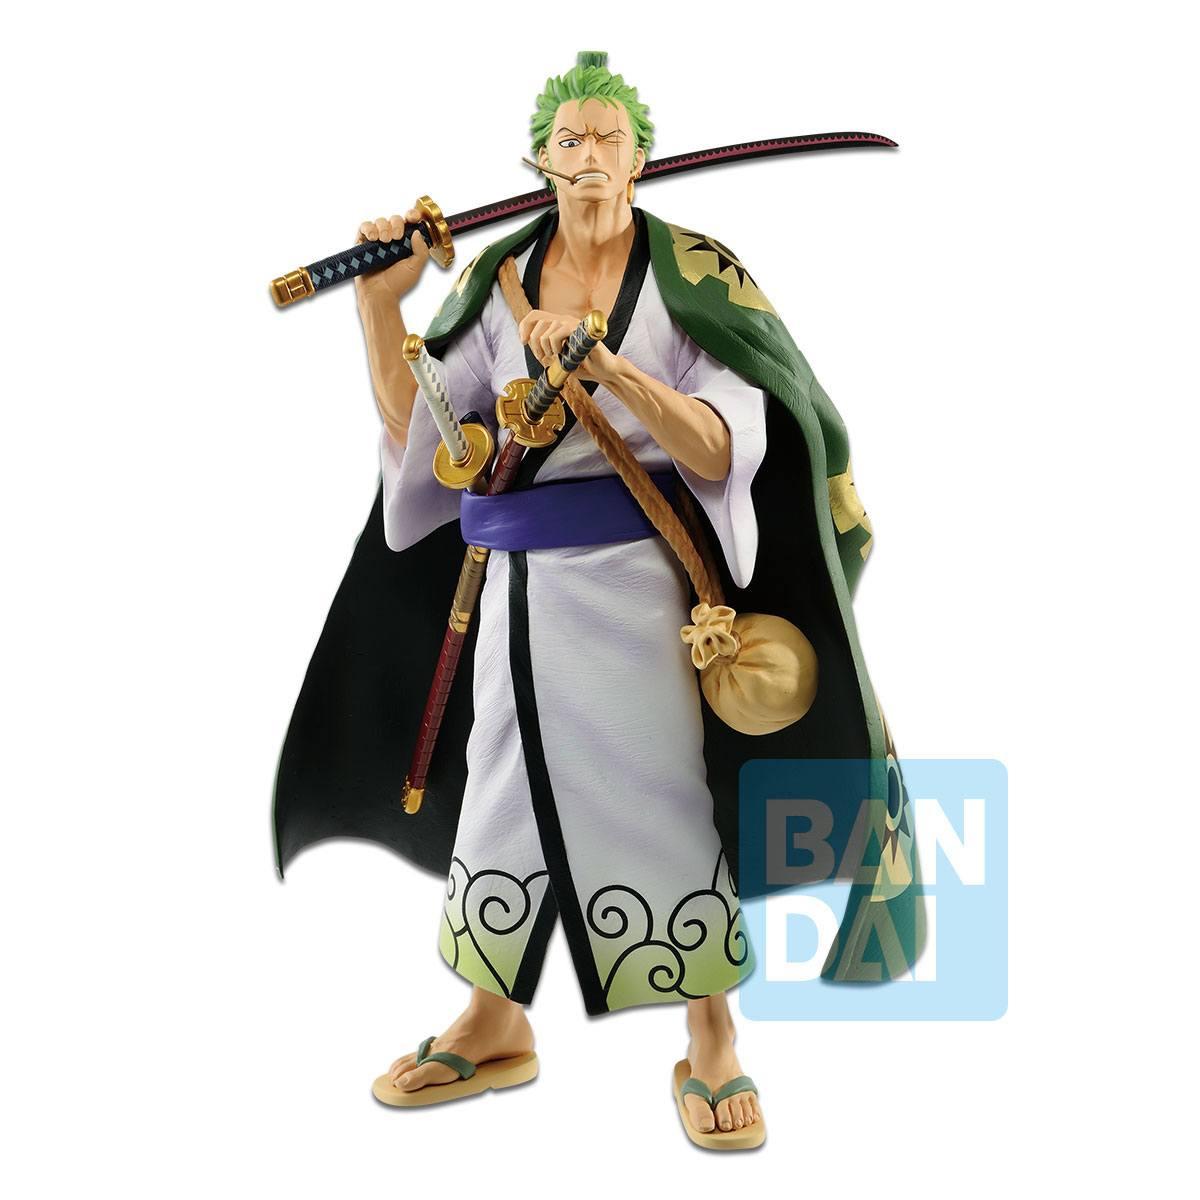 Bandai - One Piece Figure Zoro Japanese Style 26 cm